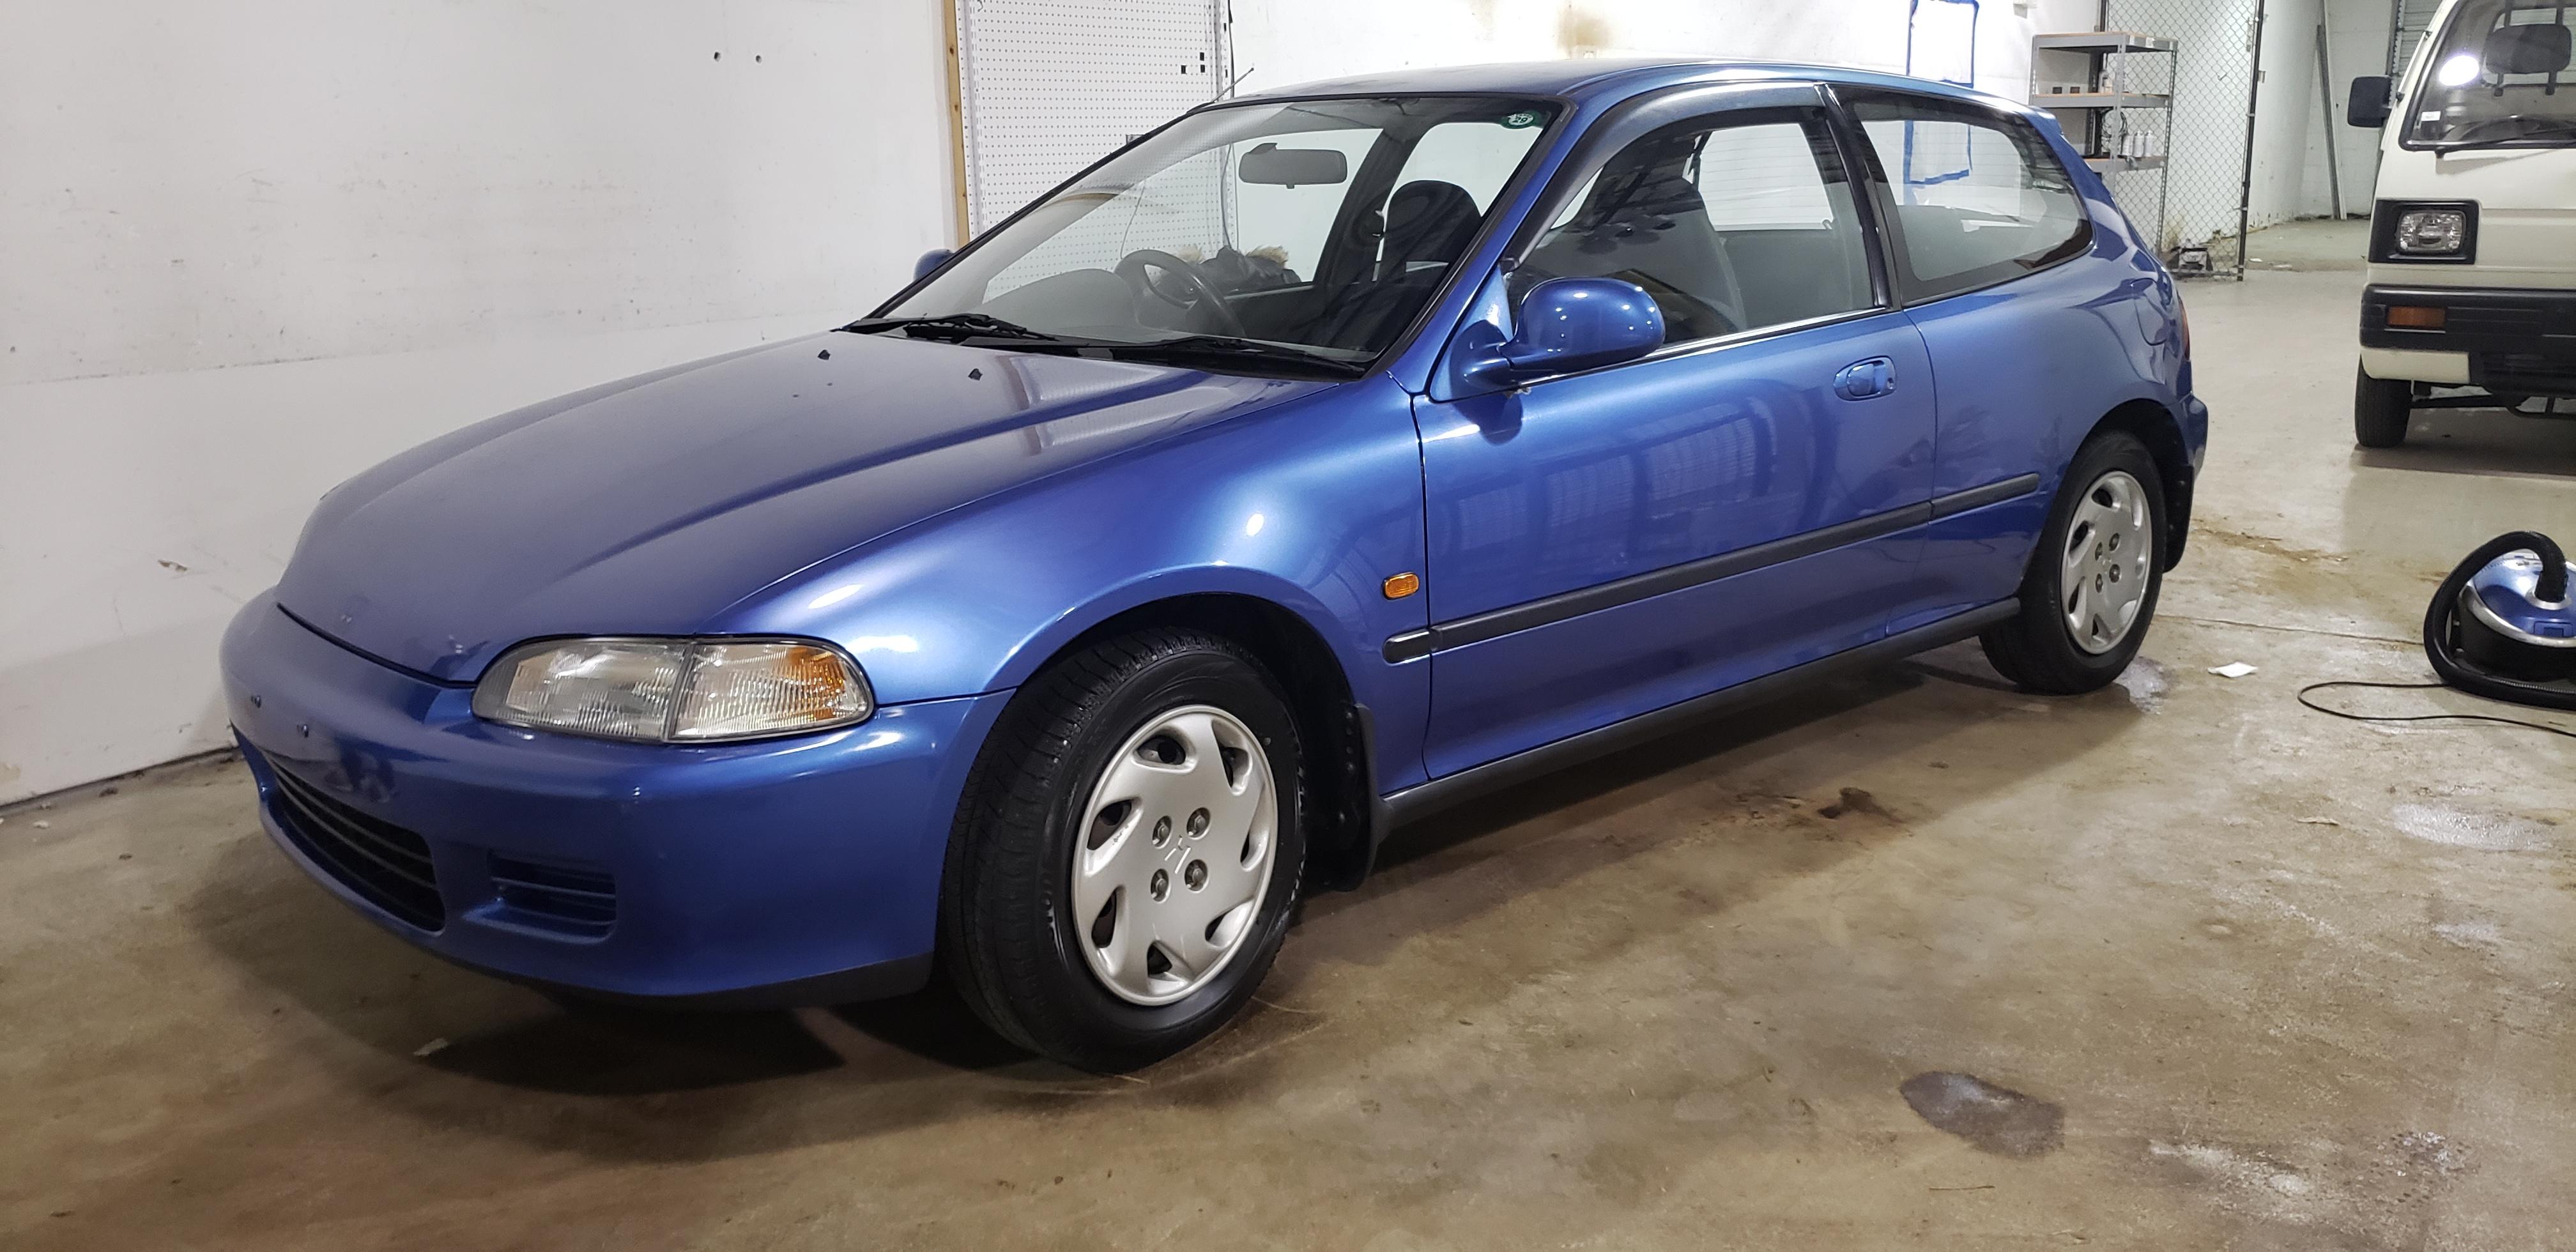 1993 Honda Civic EG4 Hatch - JUST ARRIVED